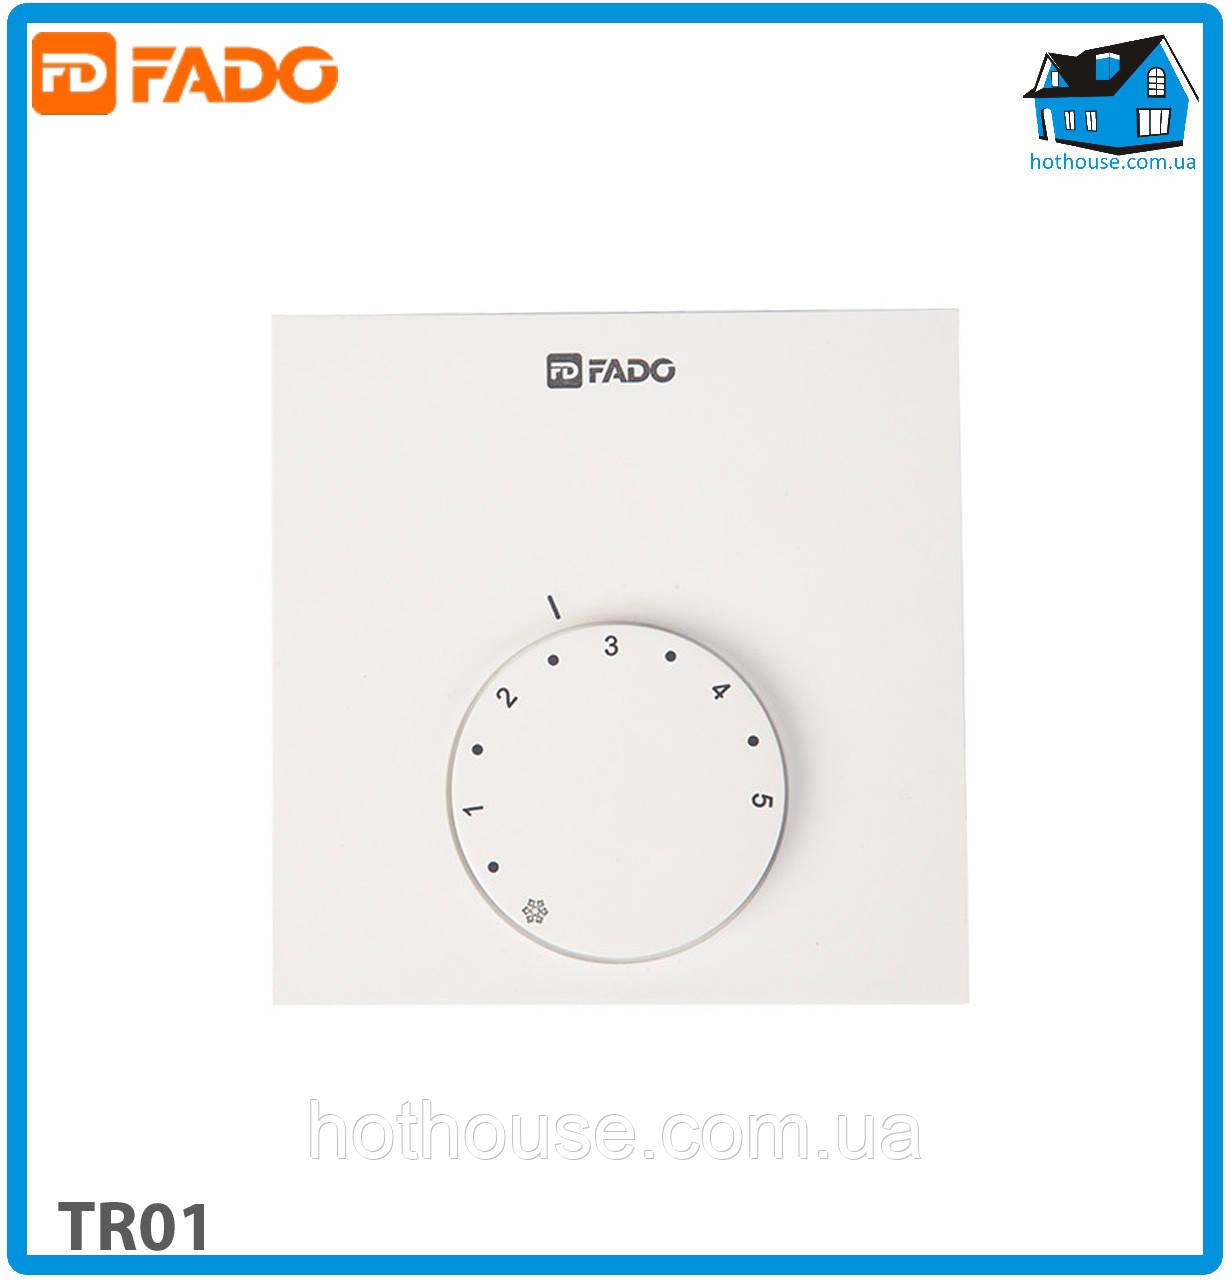 Терморегулятор виносної FADO TR01 FLOOR